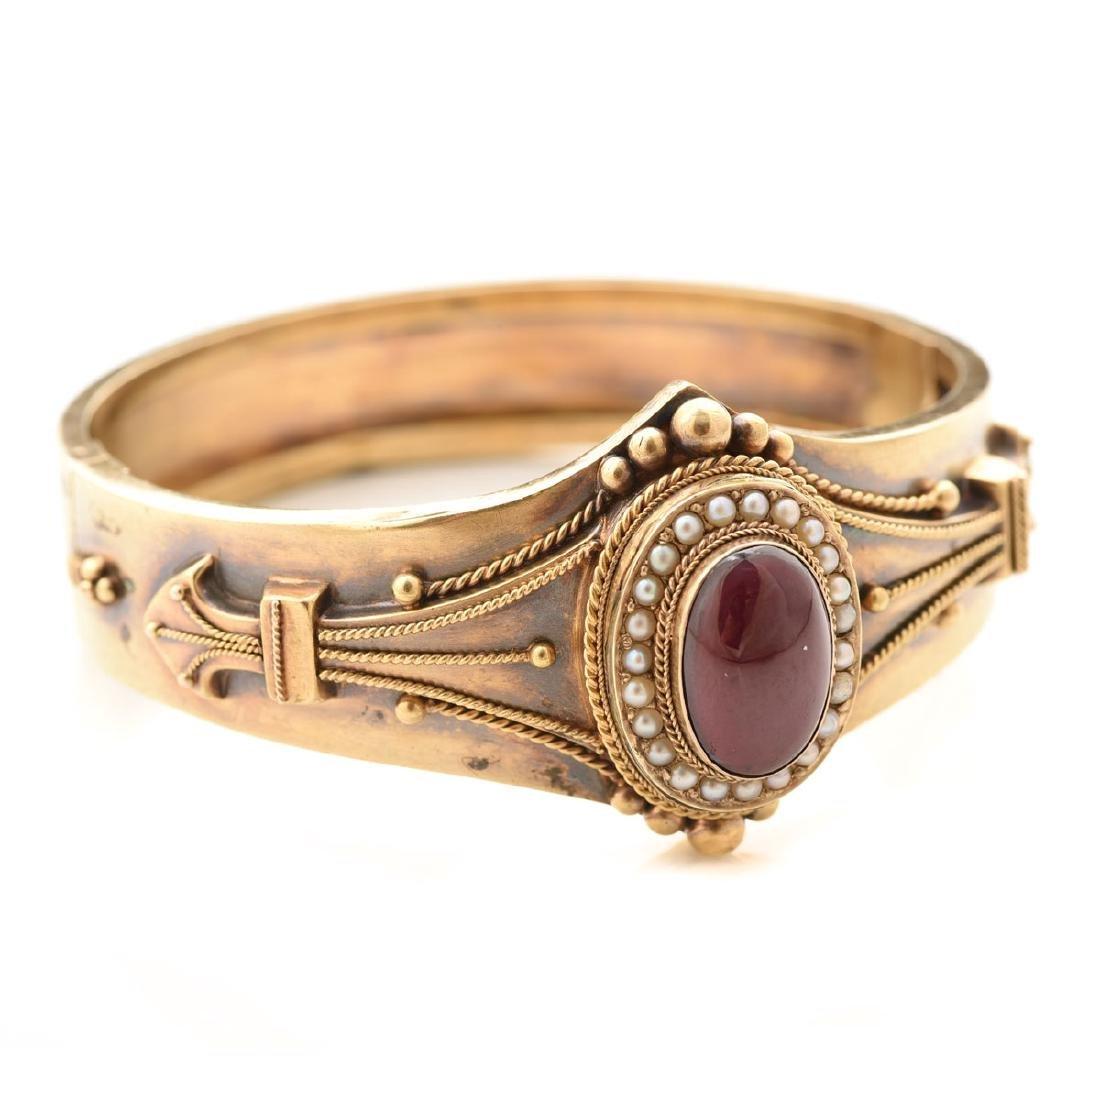 Victorian Etruscan Revival Garnet, Seed Pearl, 14k